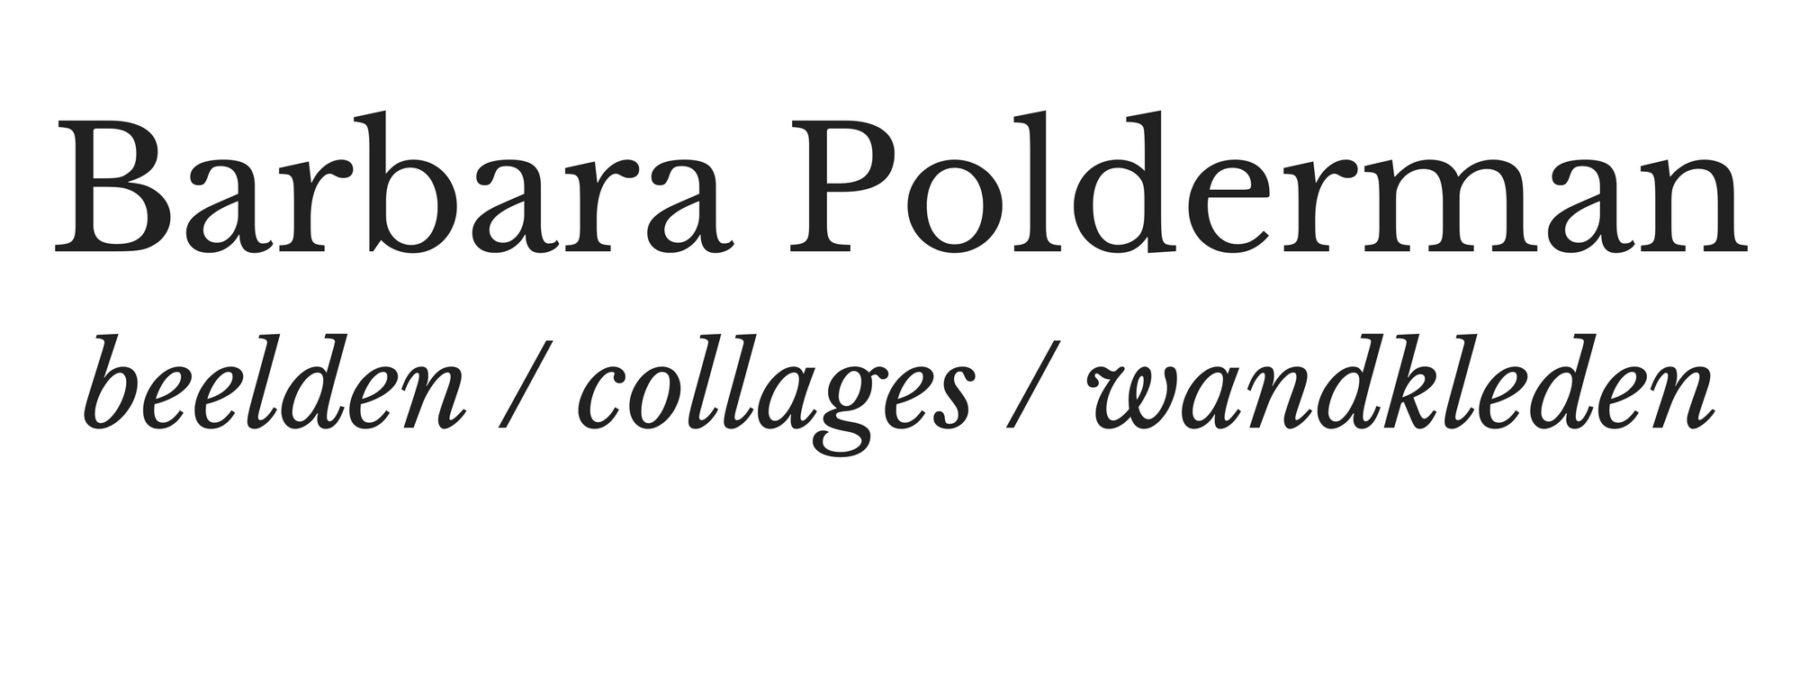 Barbara Polderman